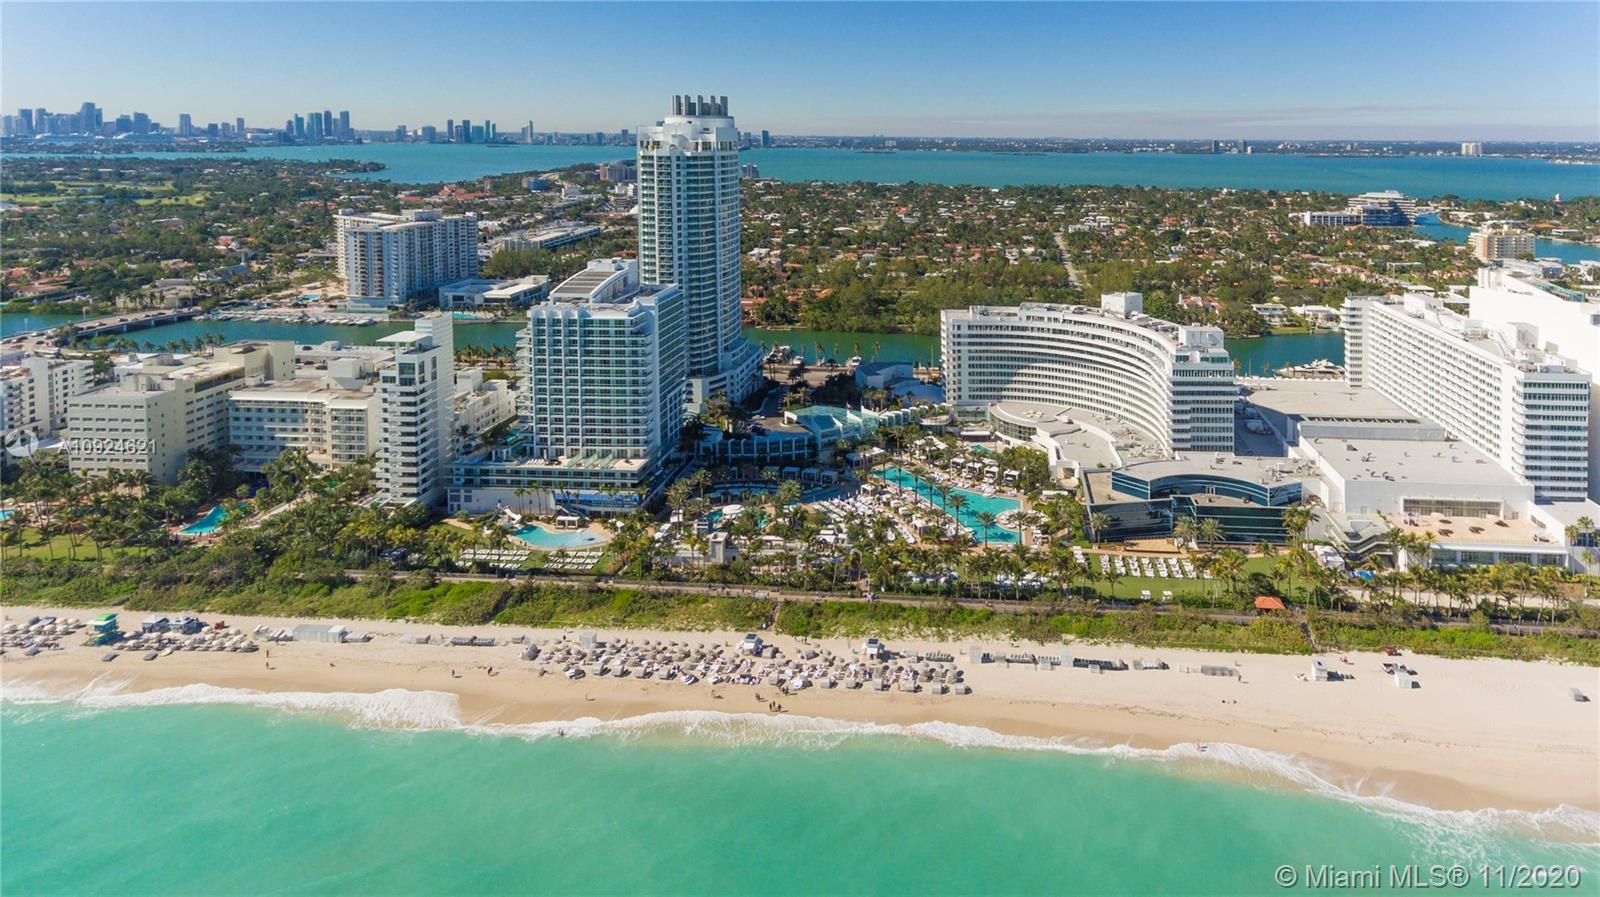 Fontainebleau Sorrento #1016 - 4391 COLLINS AVE #1016, Miami Beach, FL 33140